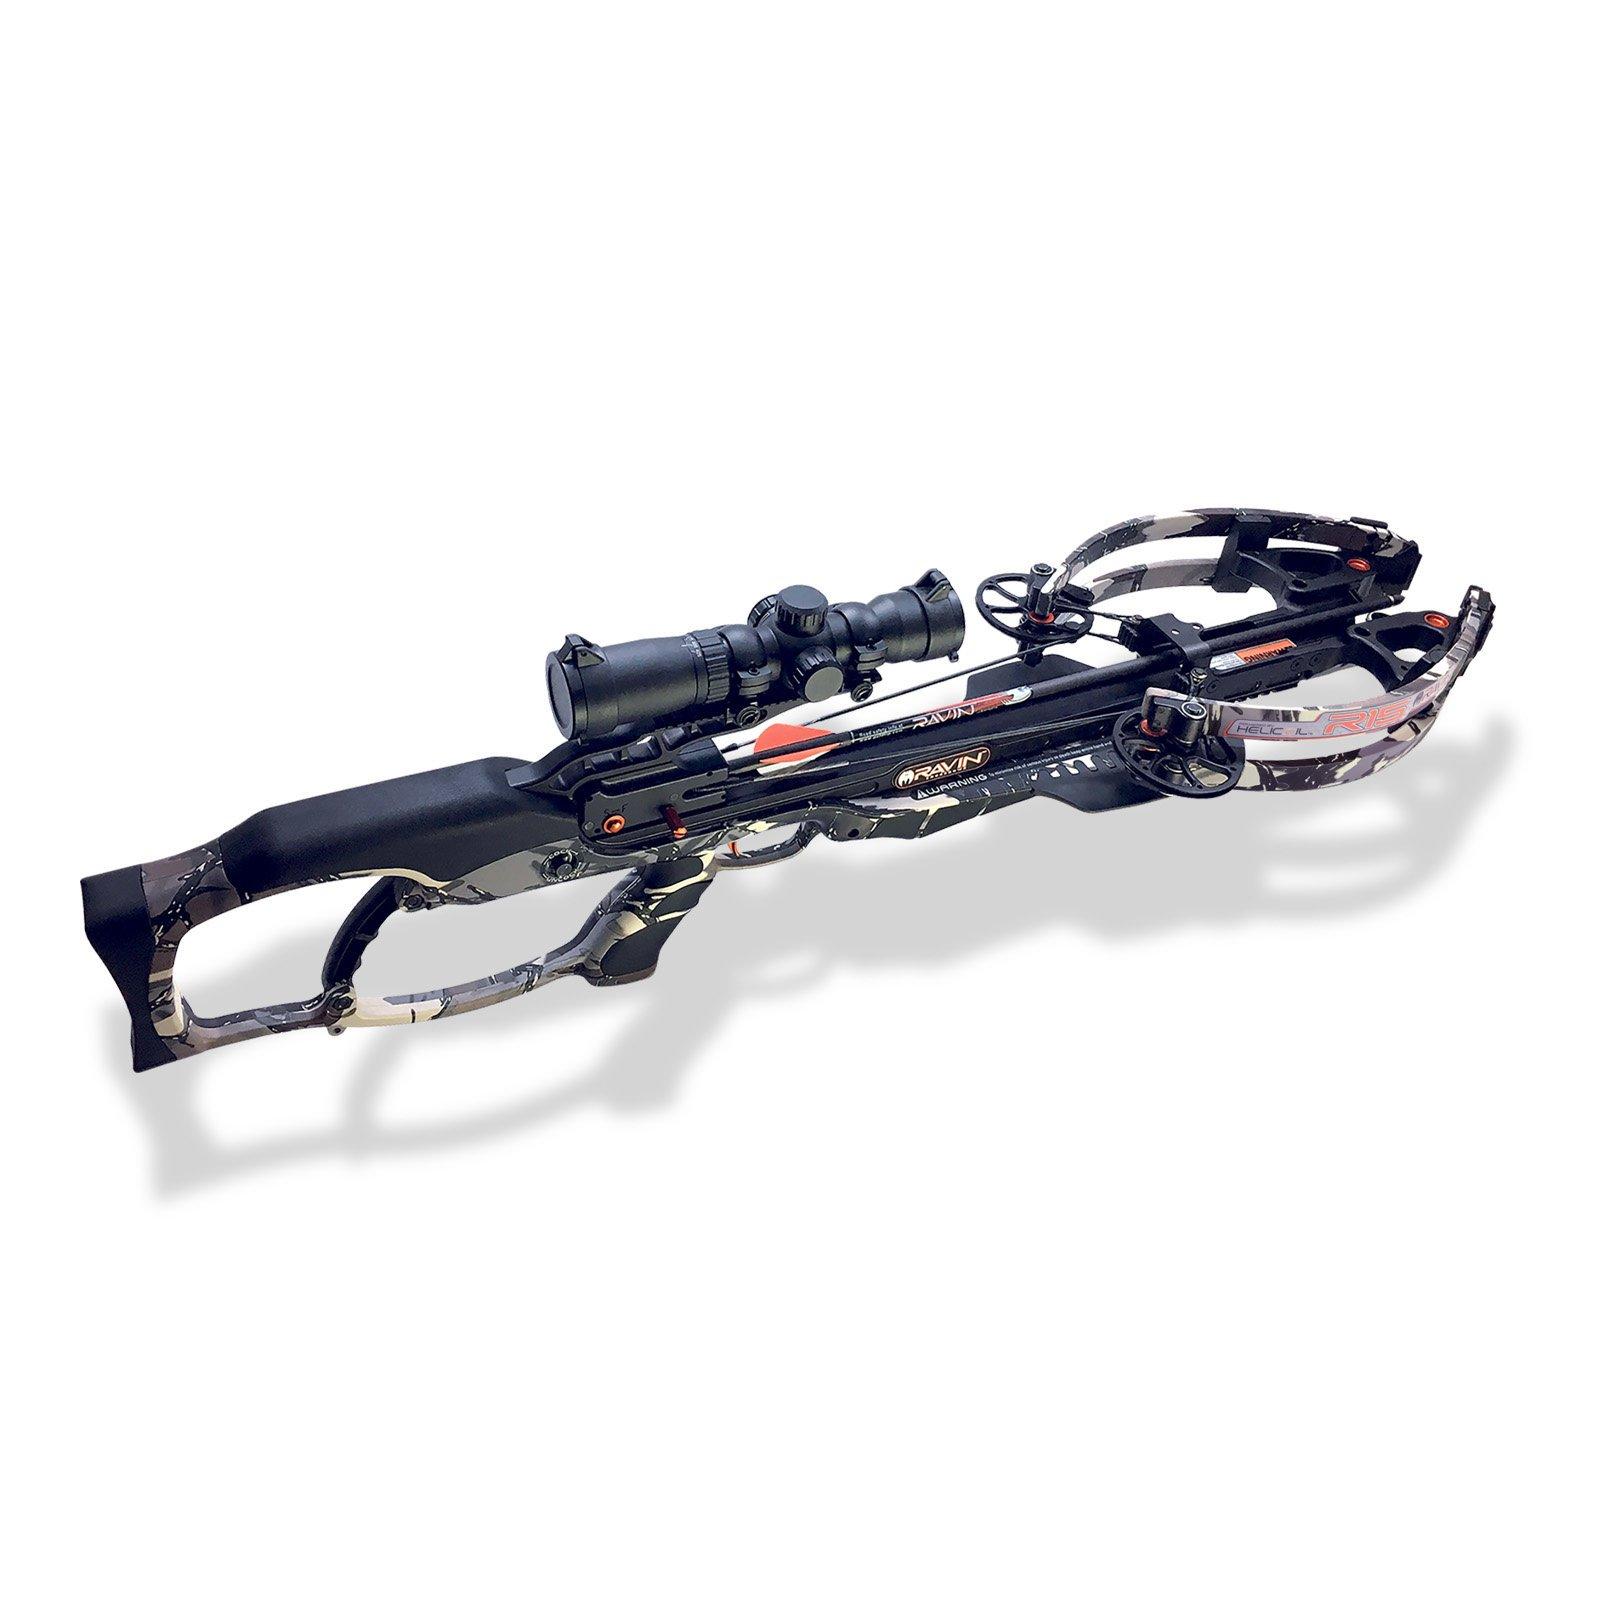 Ravin Crossbows R15 Predator Crossbow Package - Camo